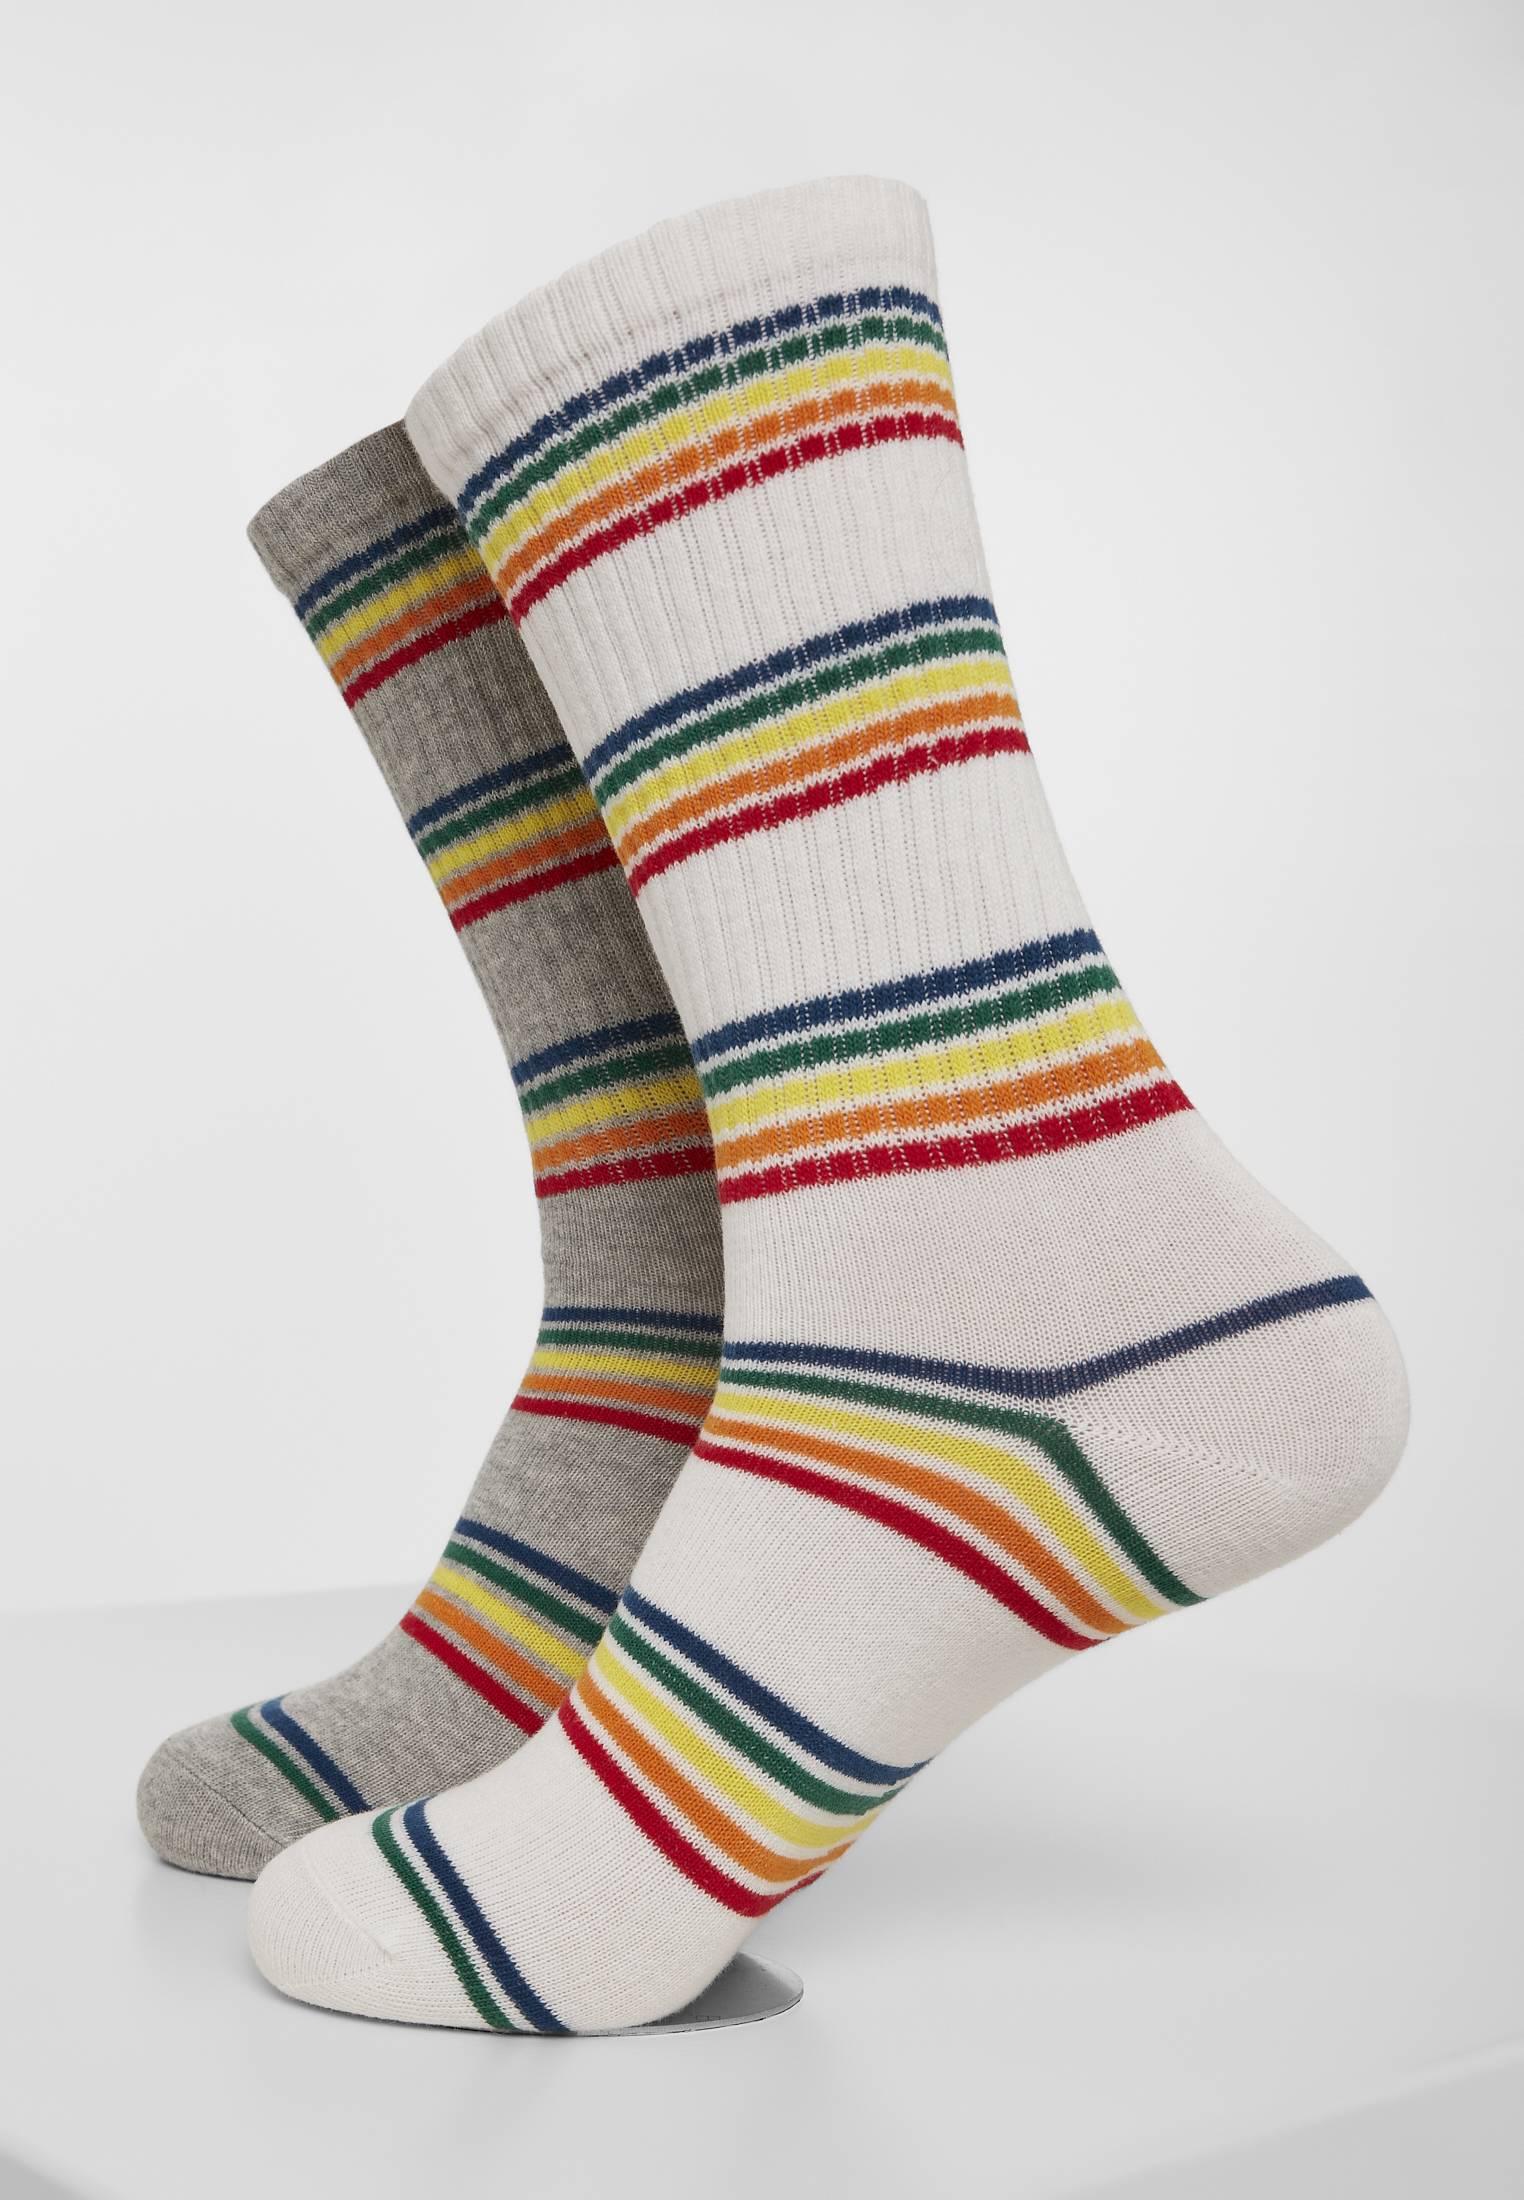 Urban Classics Rainbow Stripes Socks 2-Pack grey/white - 47-50